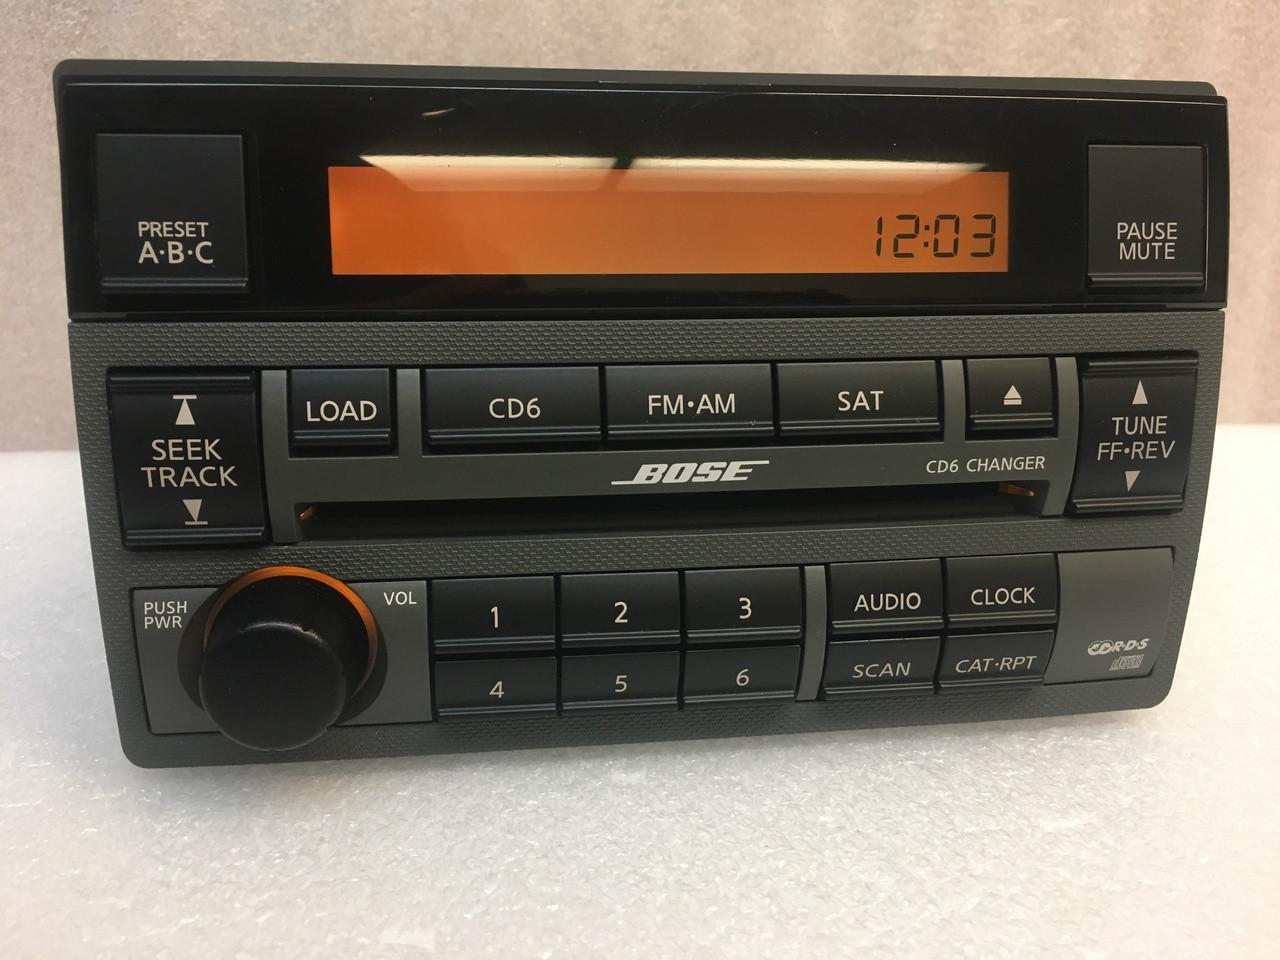 2005 2006 Nissan Altima Bose Radio Stereo Cd Player Radio